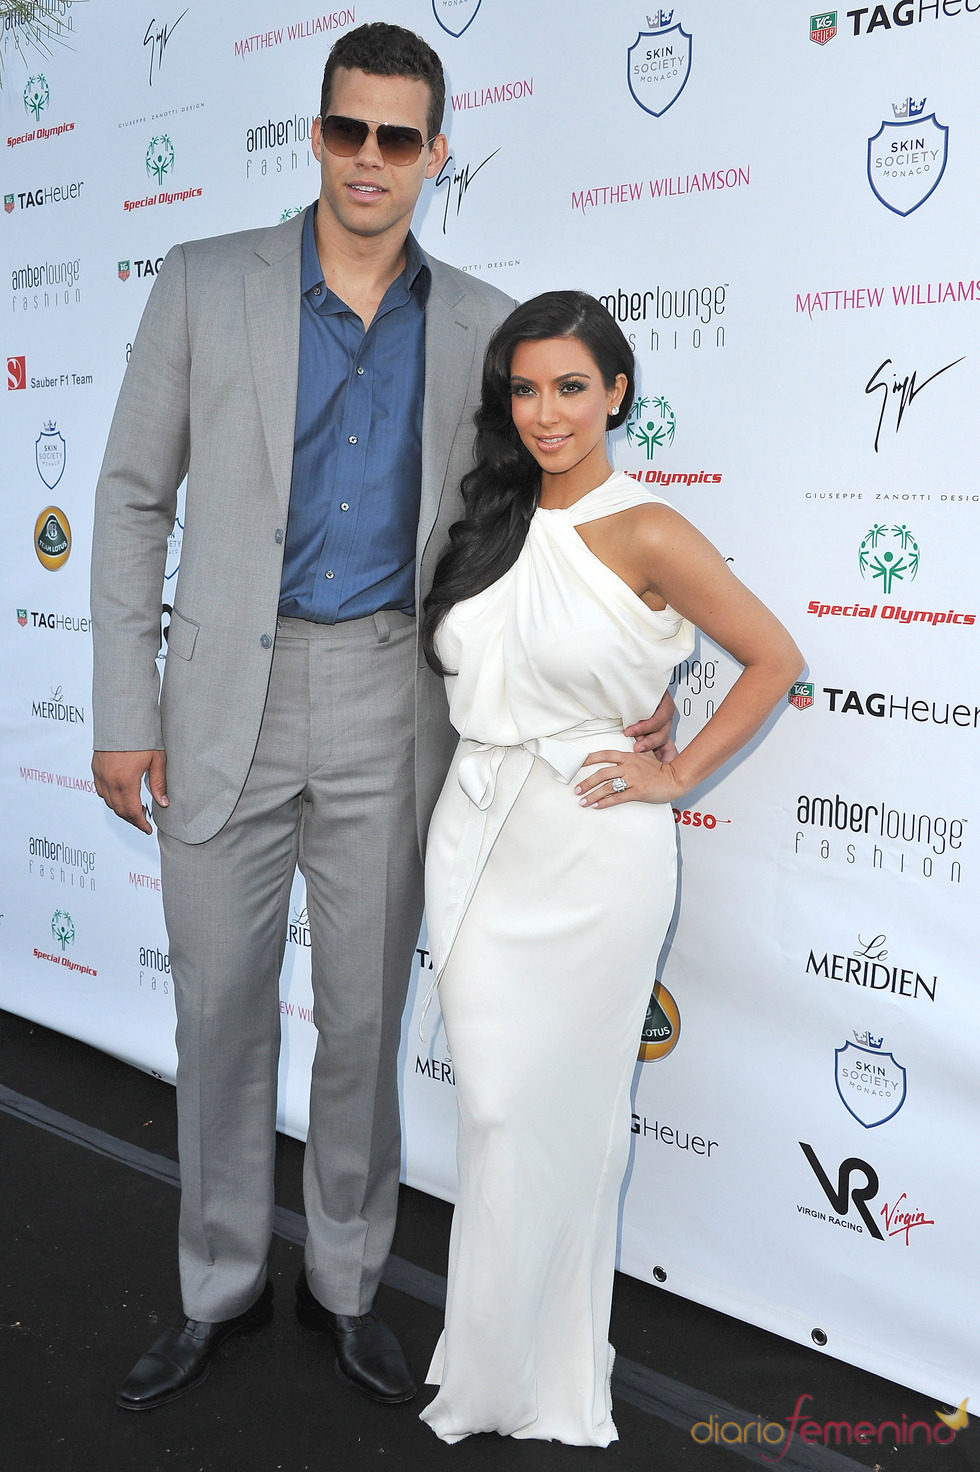 Kim Kardashian y su prometido en el Amber Lounge Fashion 2011